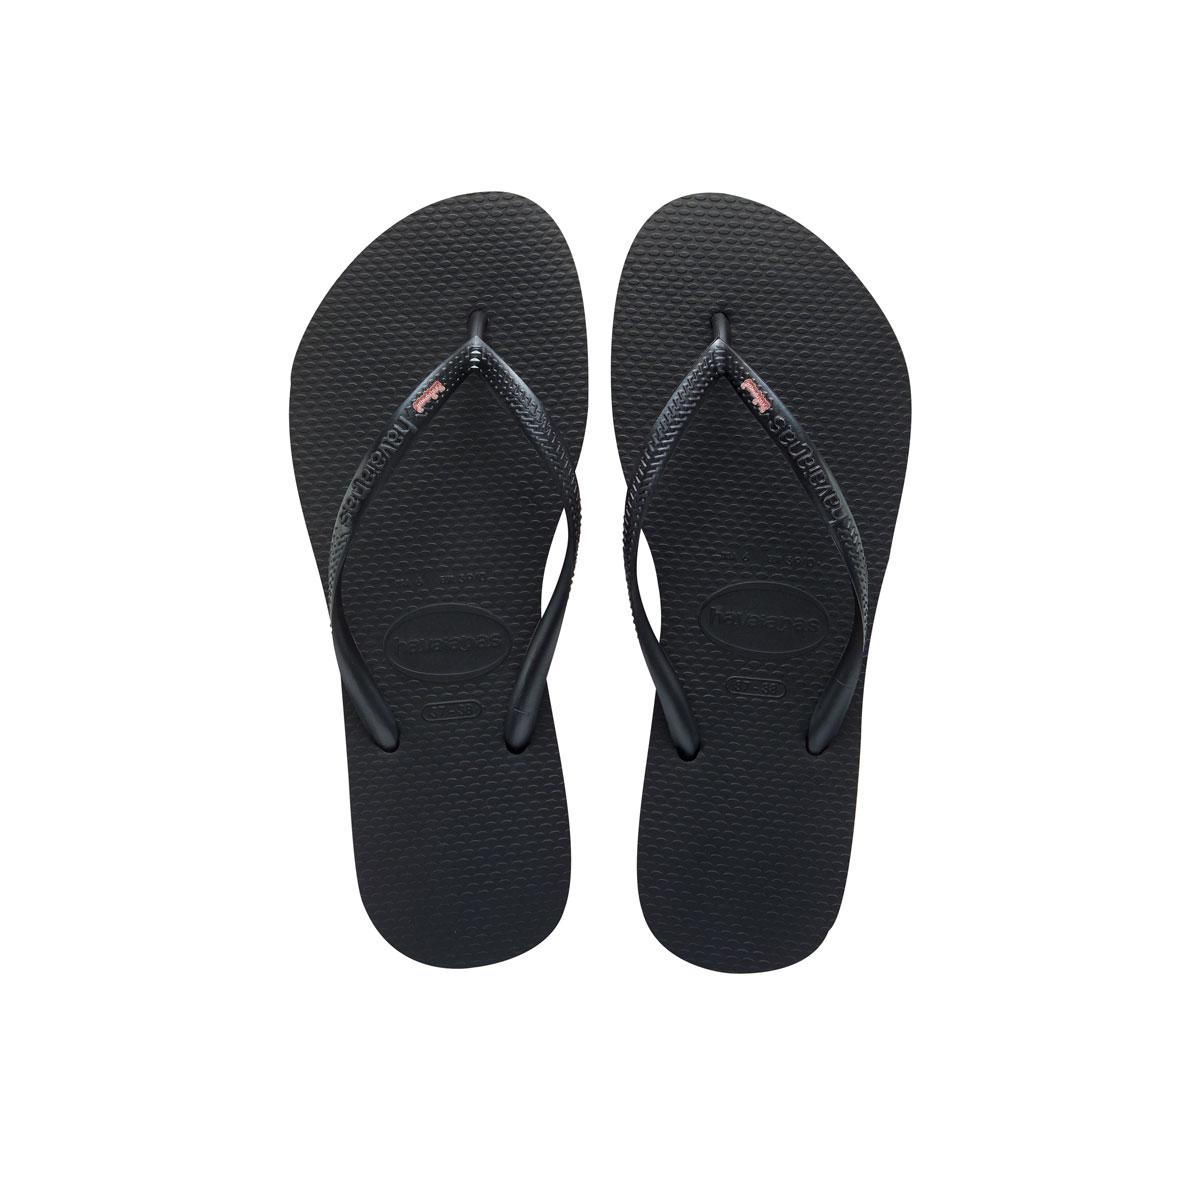 Havaianas Slim Black Flip-Flops with Pink Glitter Bridesmaid Charm